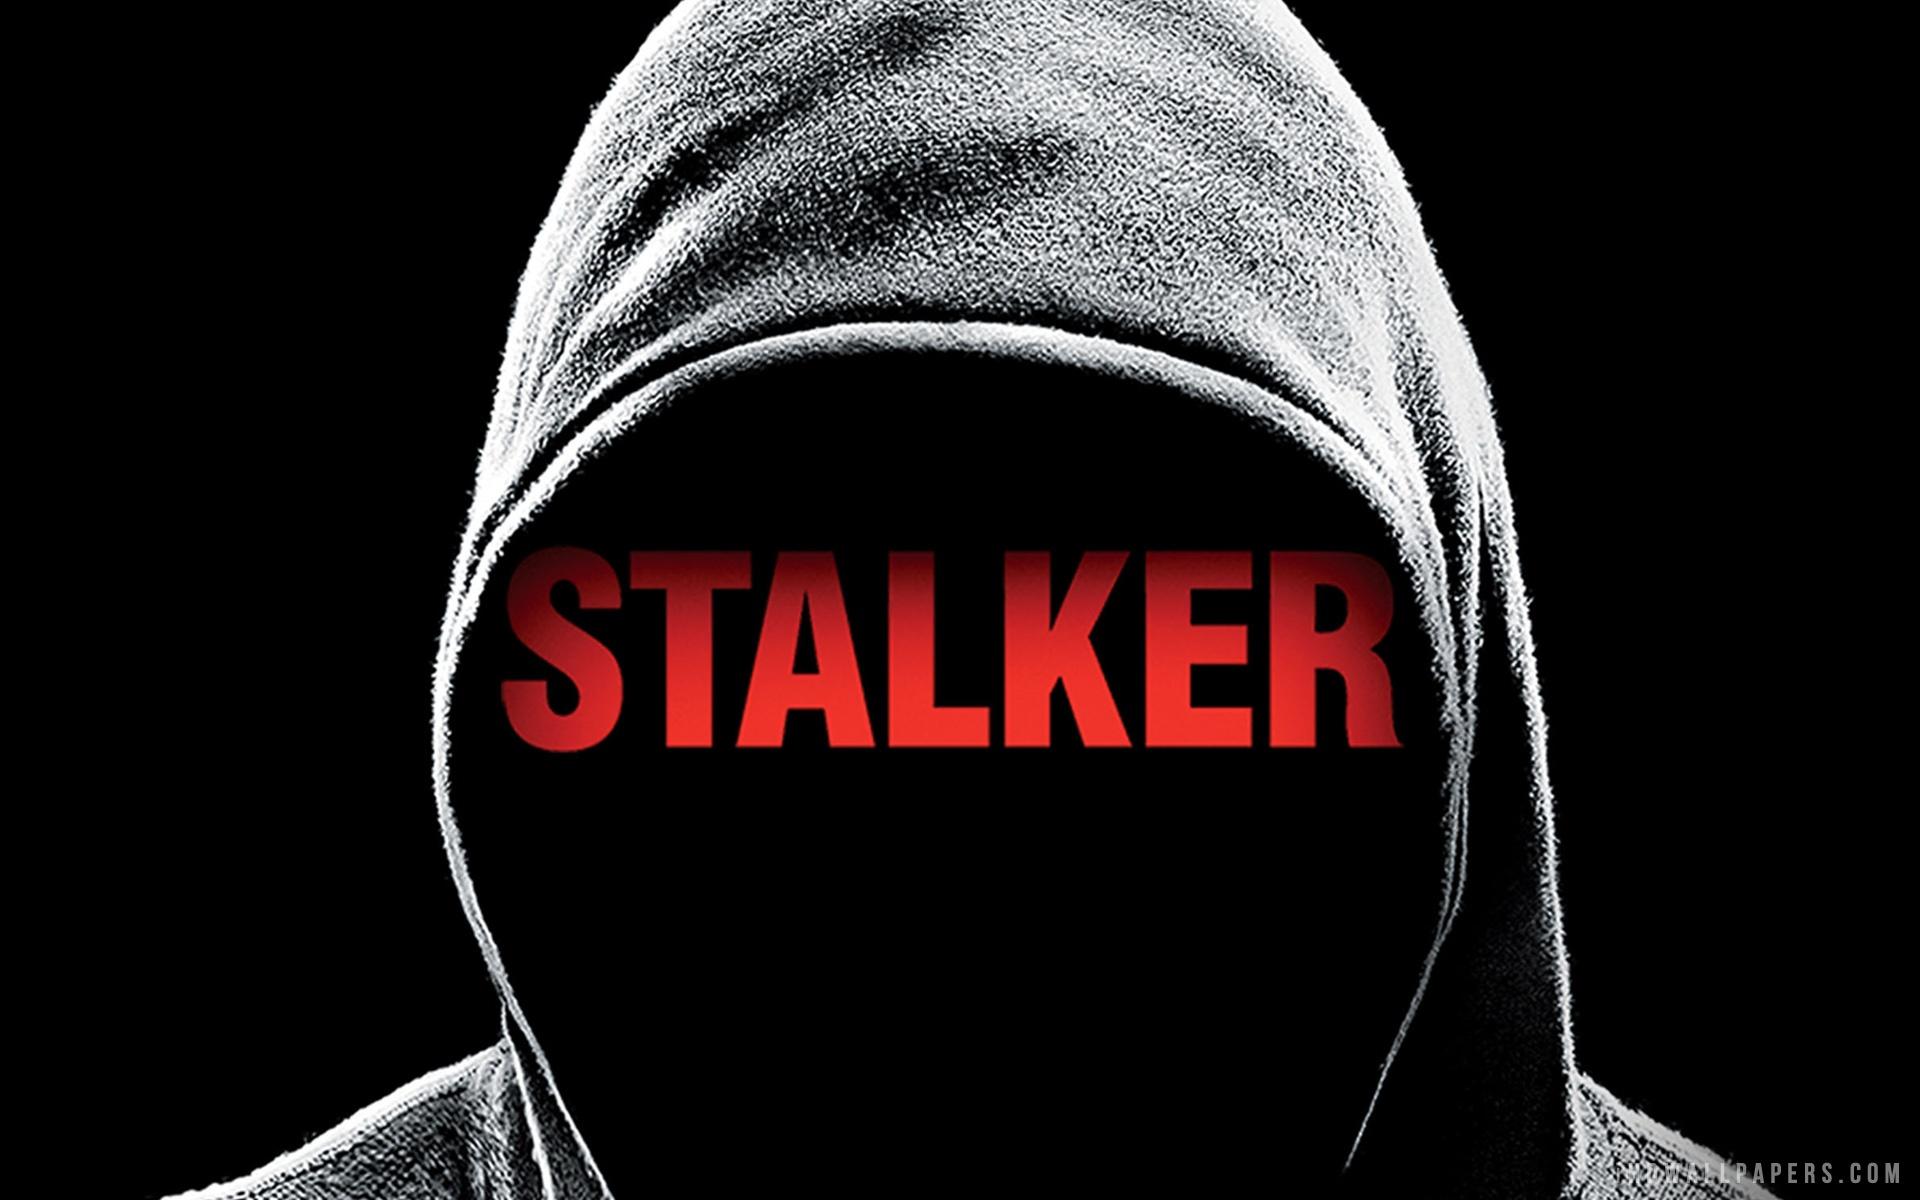 70+] Stalker Background on WallpaperSafari